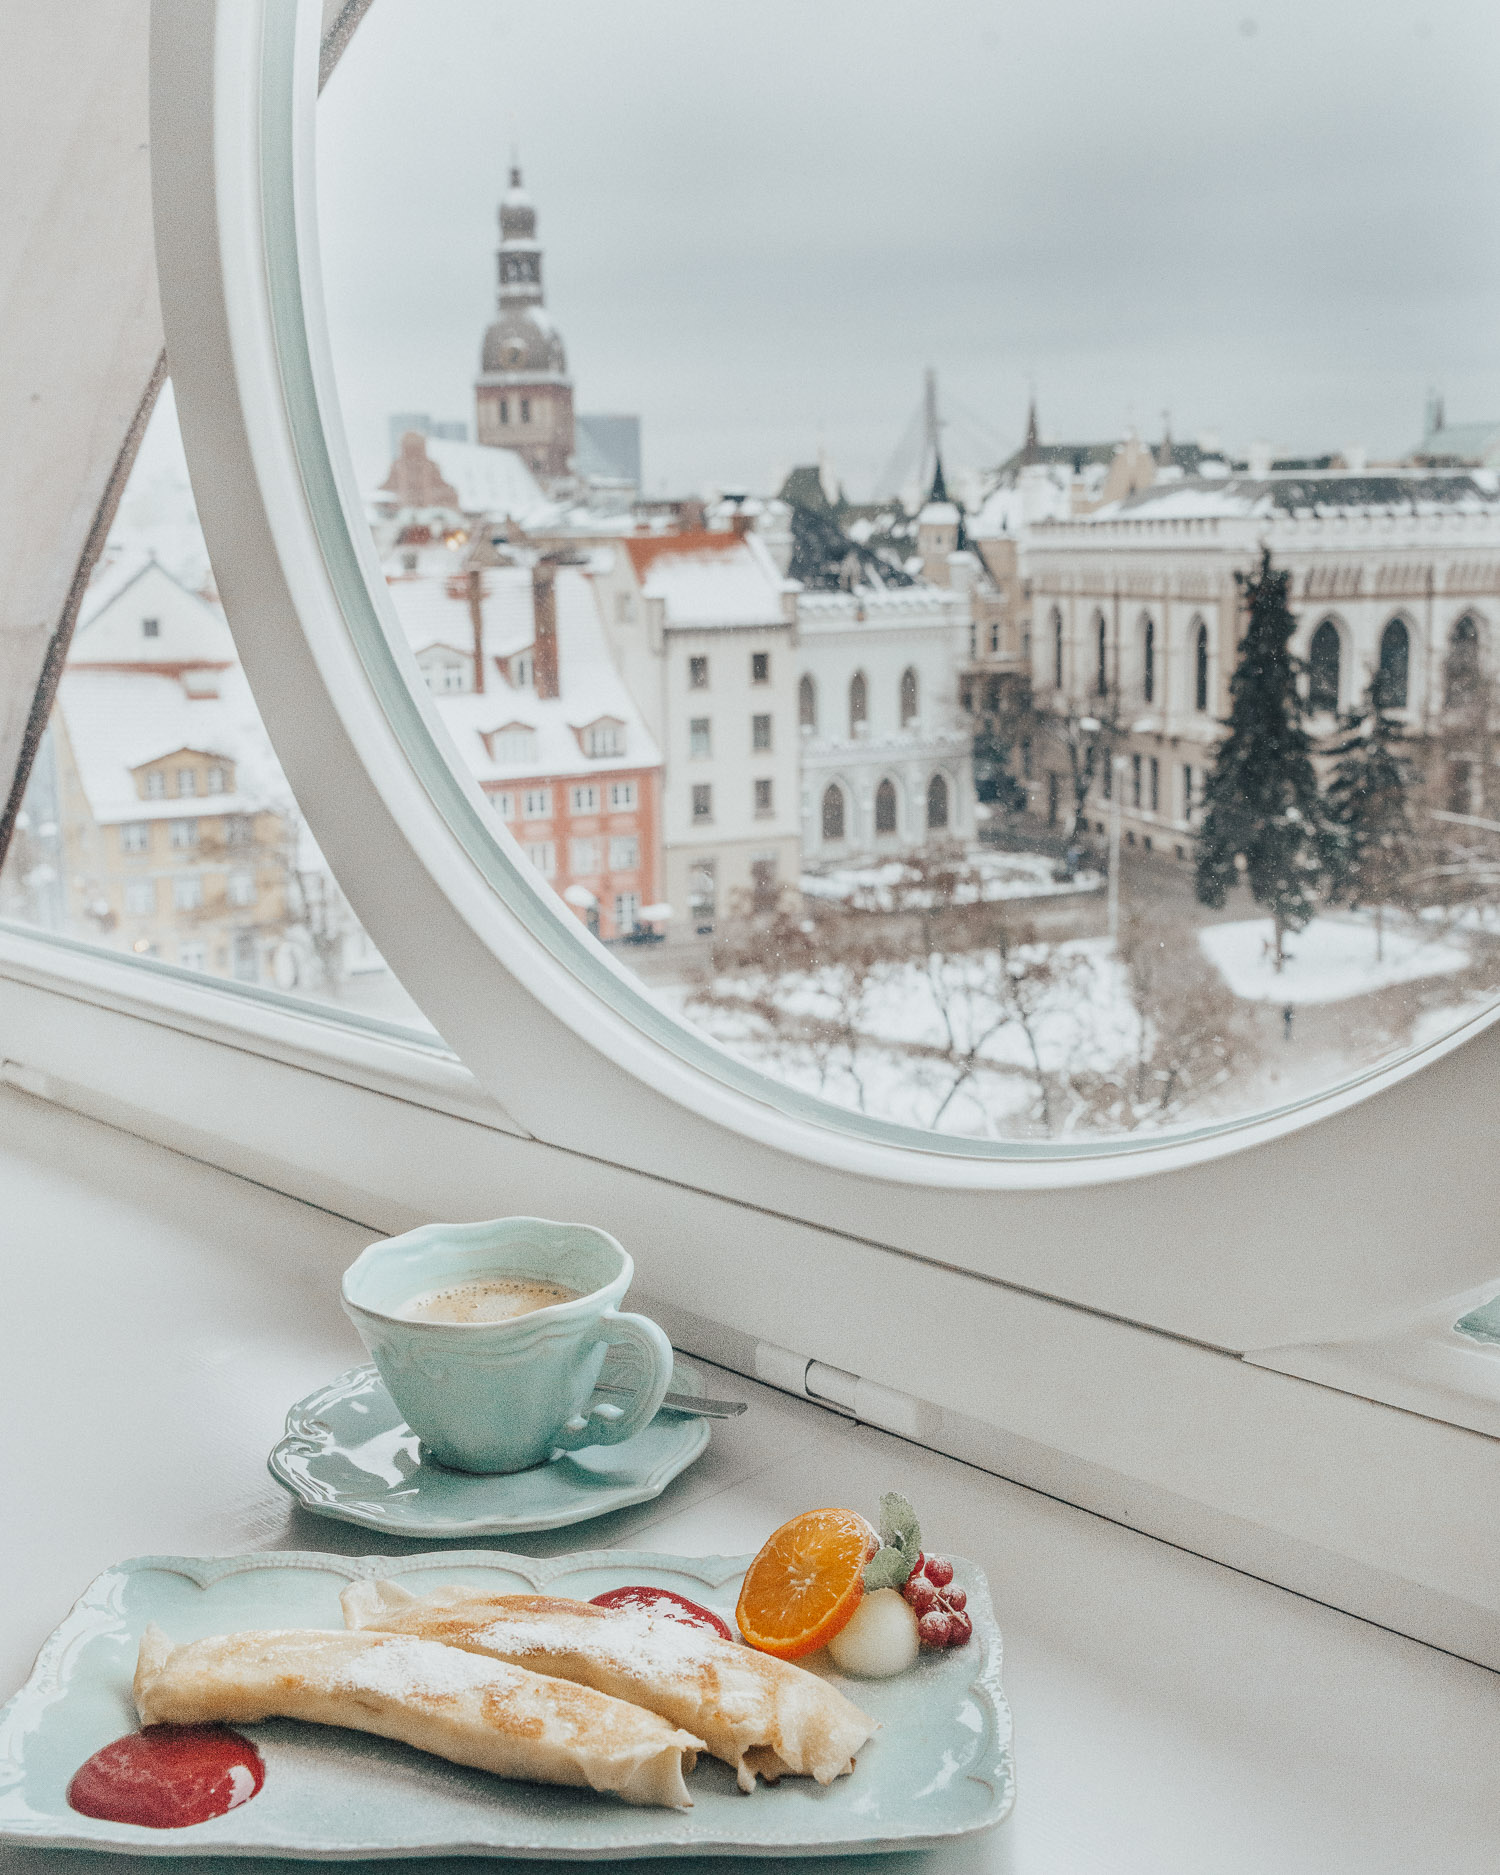 Banana pancakes for breakfast at Hotel Le Chevalier Relais, Riga